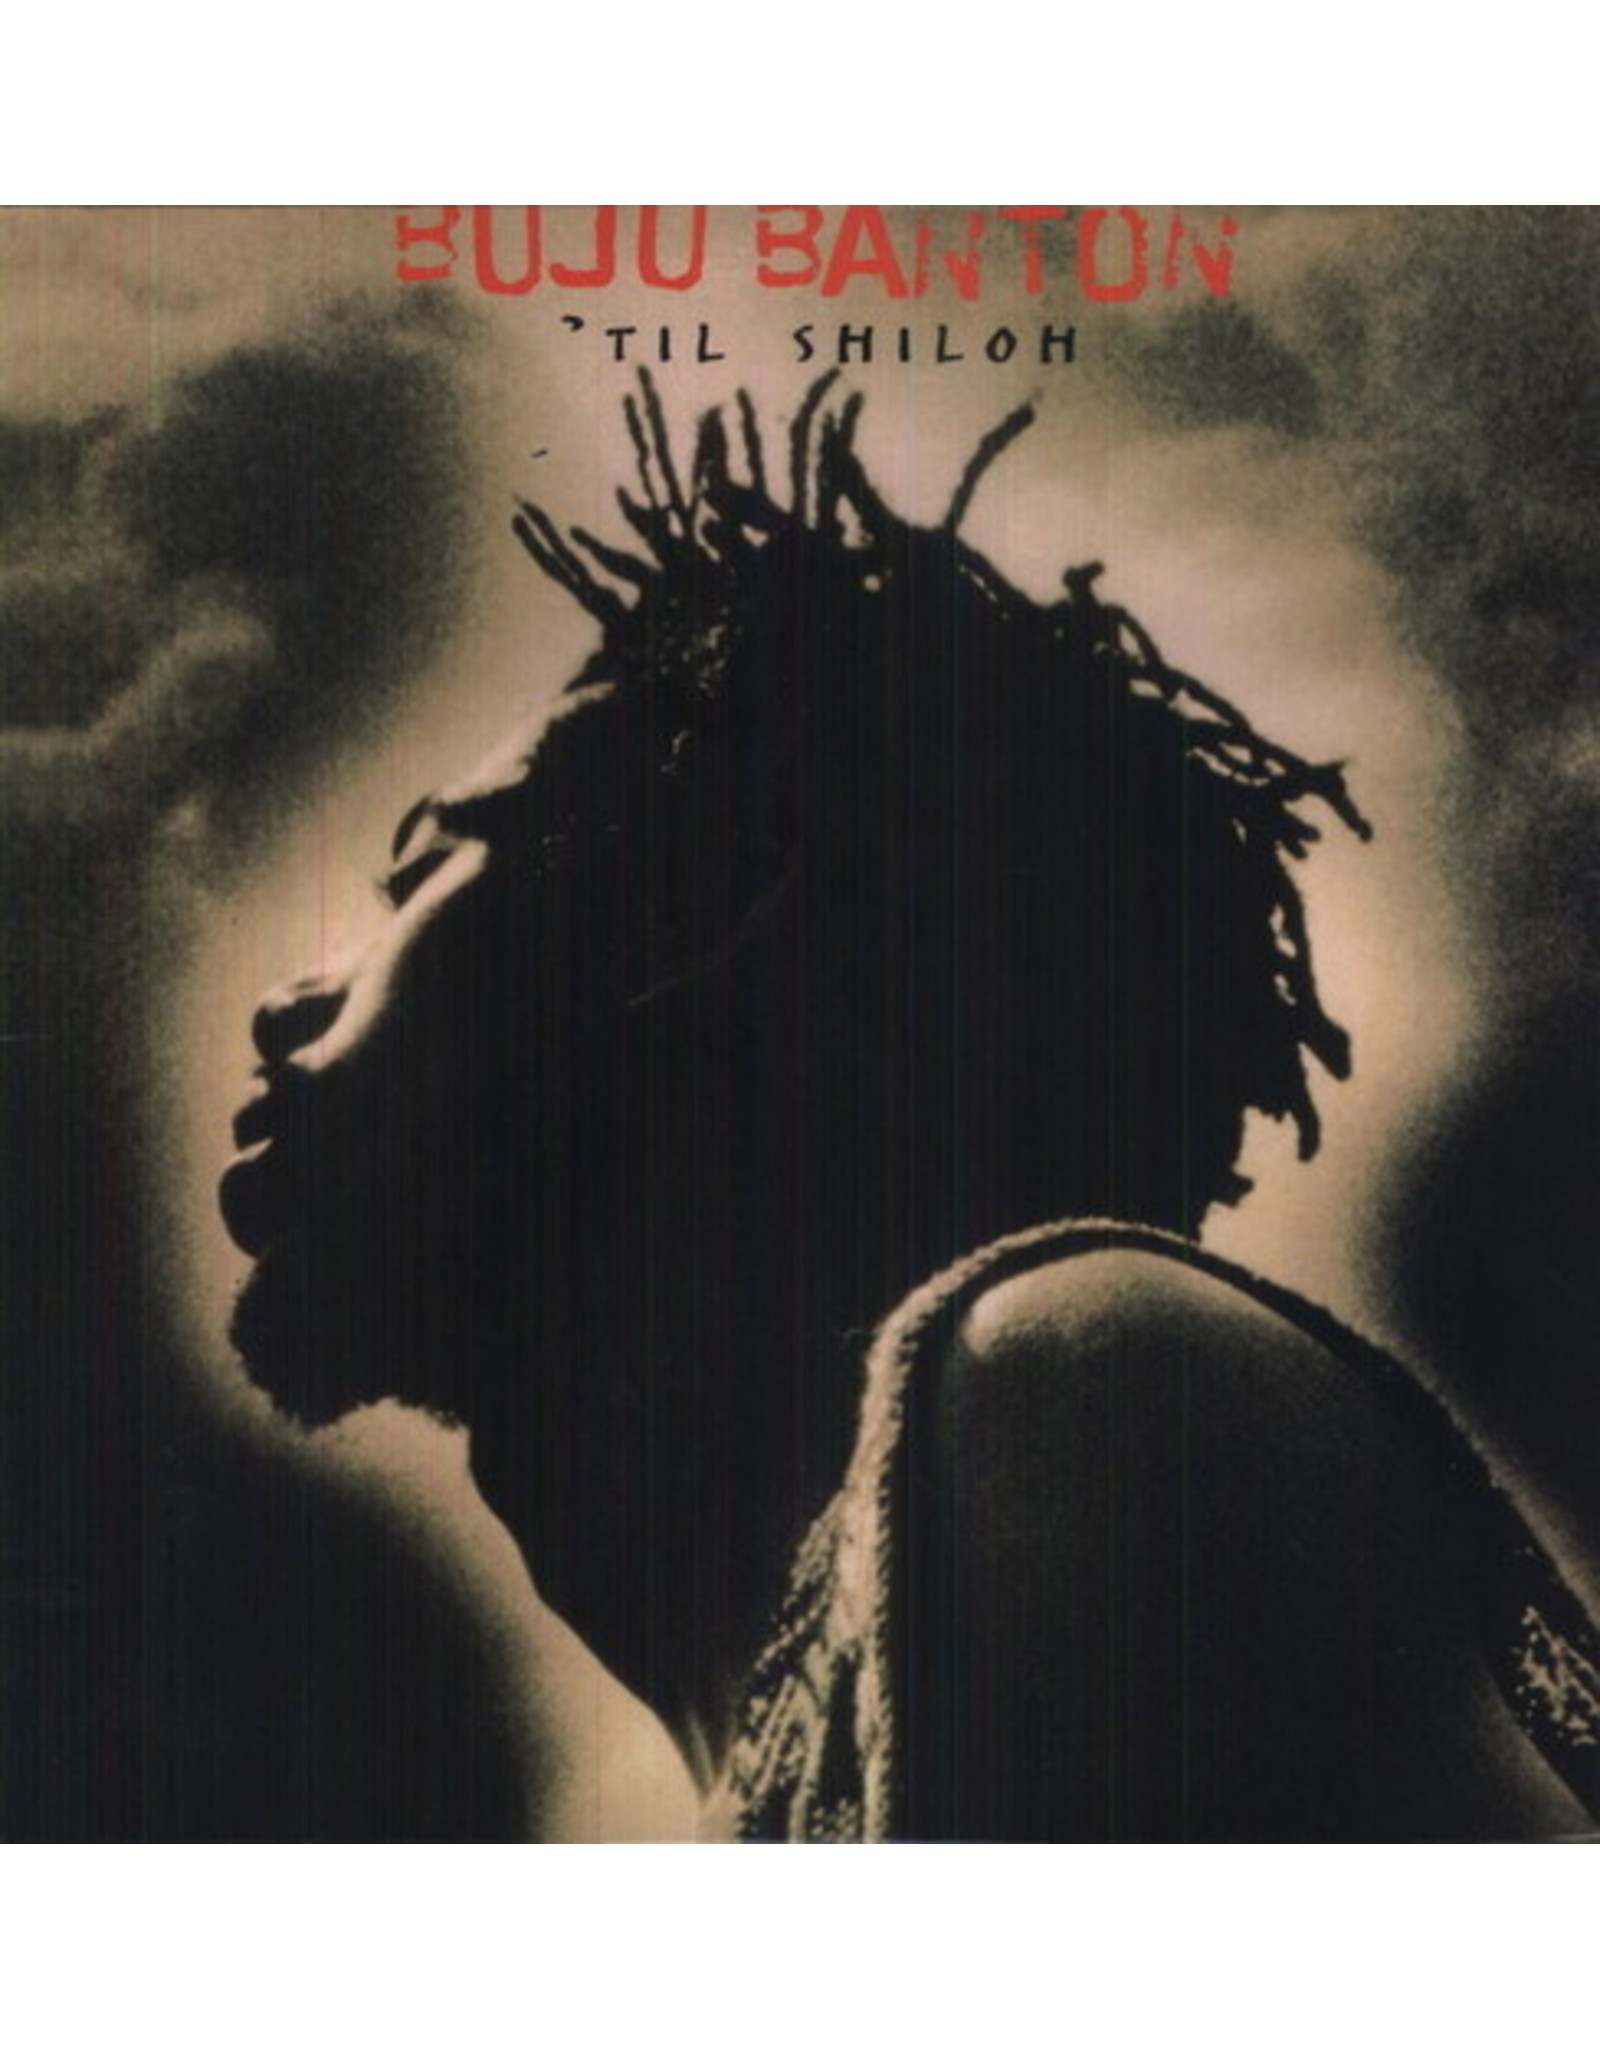 New Vinyl Buju Banton - 'Til Shiloh (25th Anniversary) 2LP